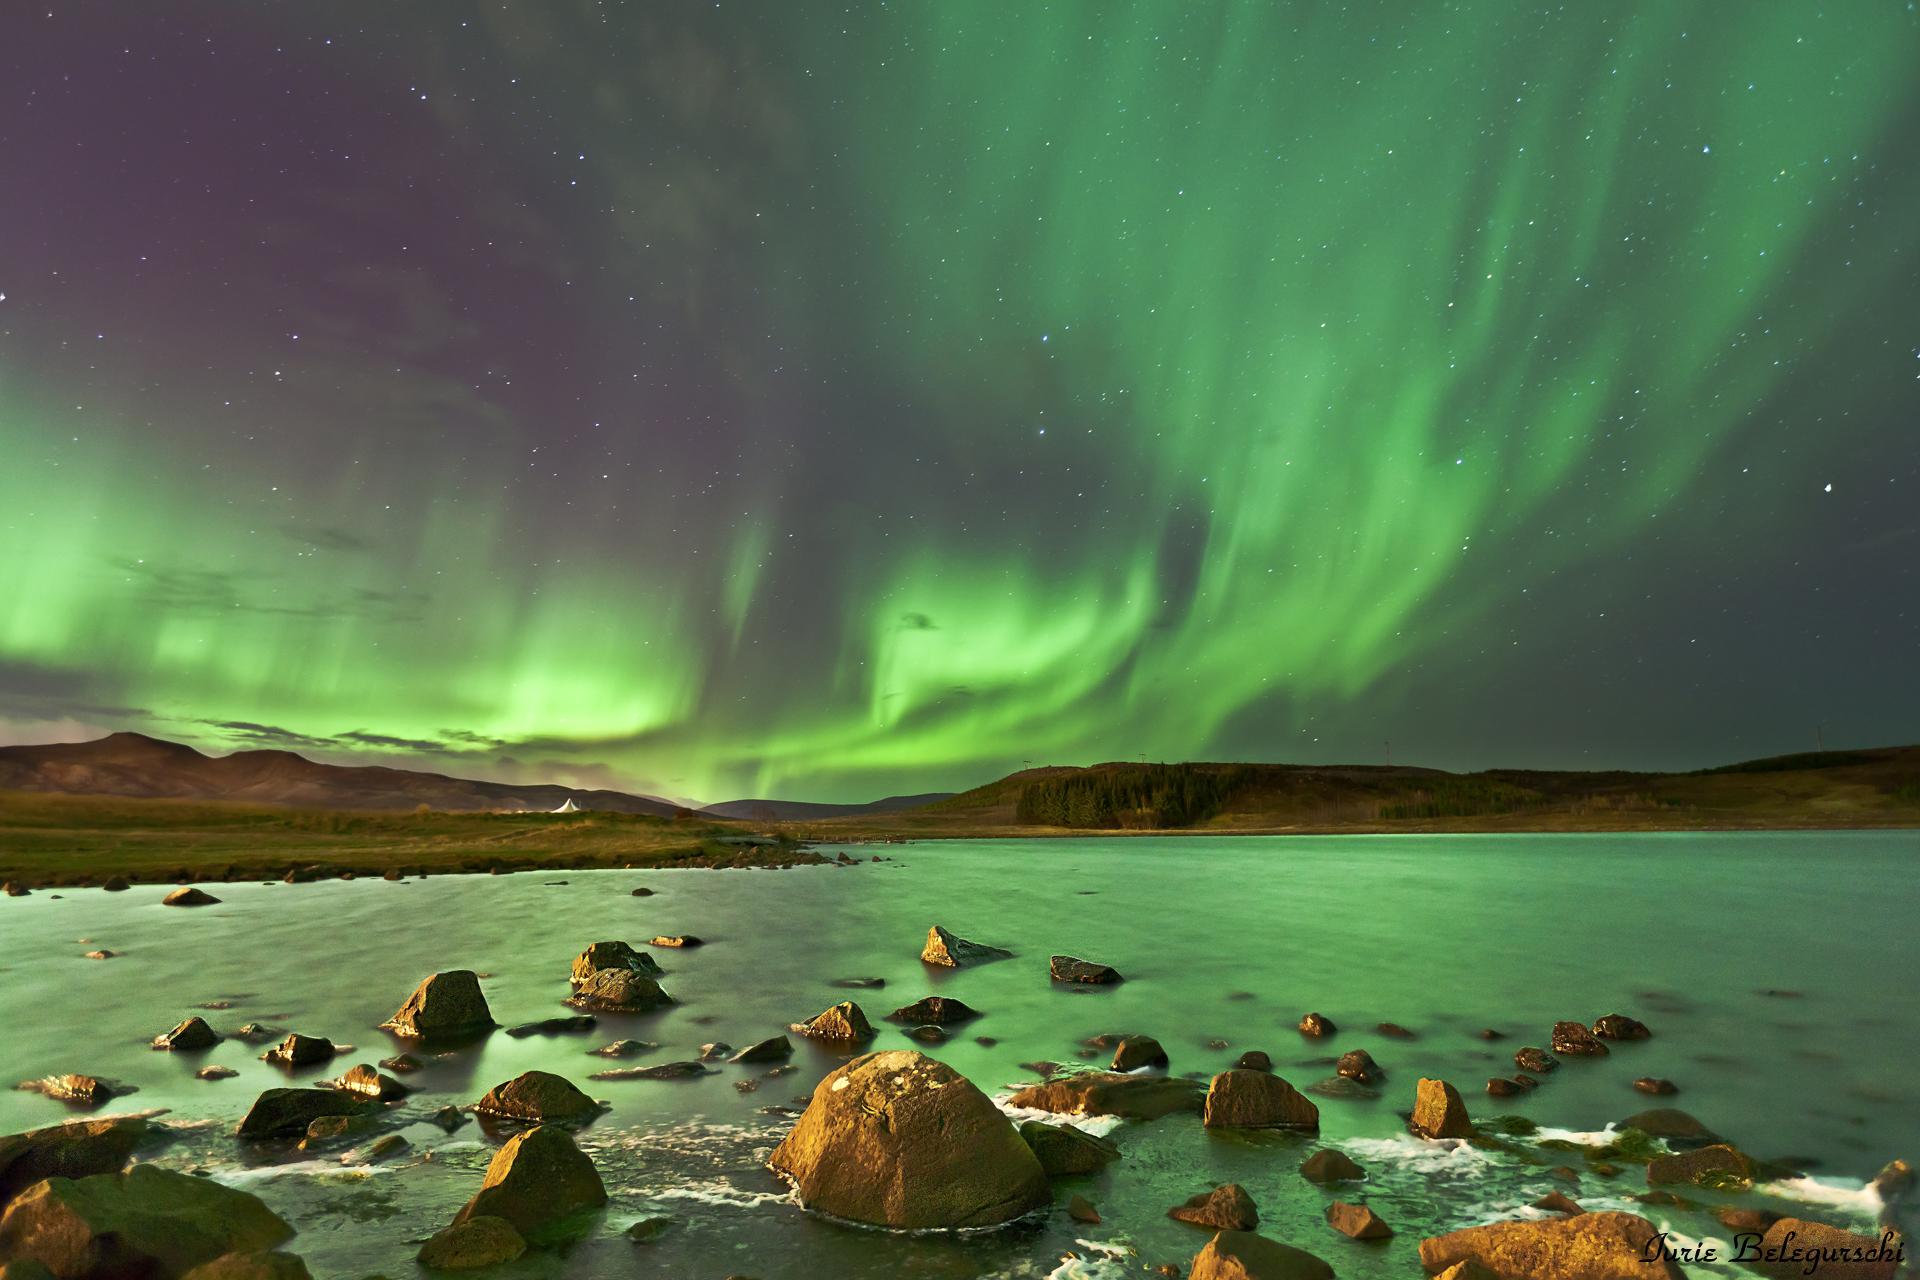 nasa northern lights forecast 2017 - photo #47